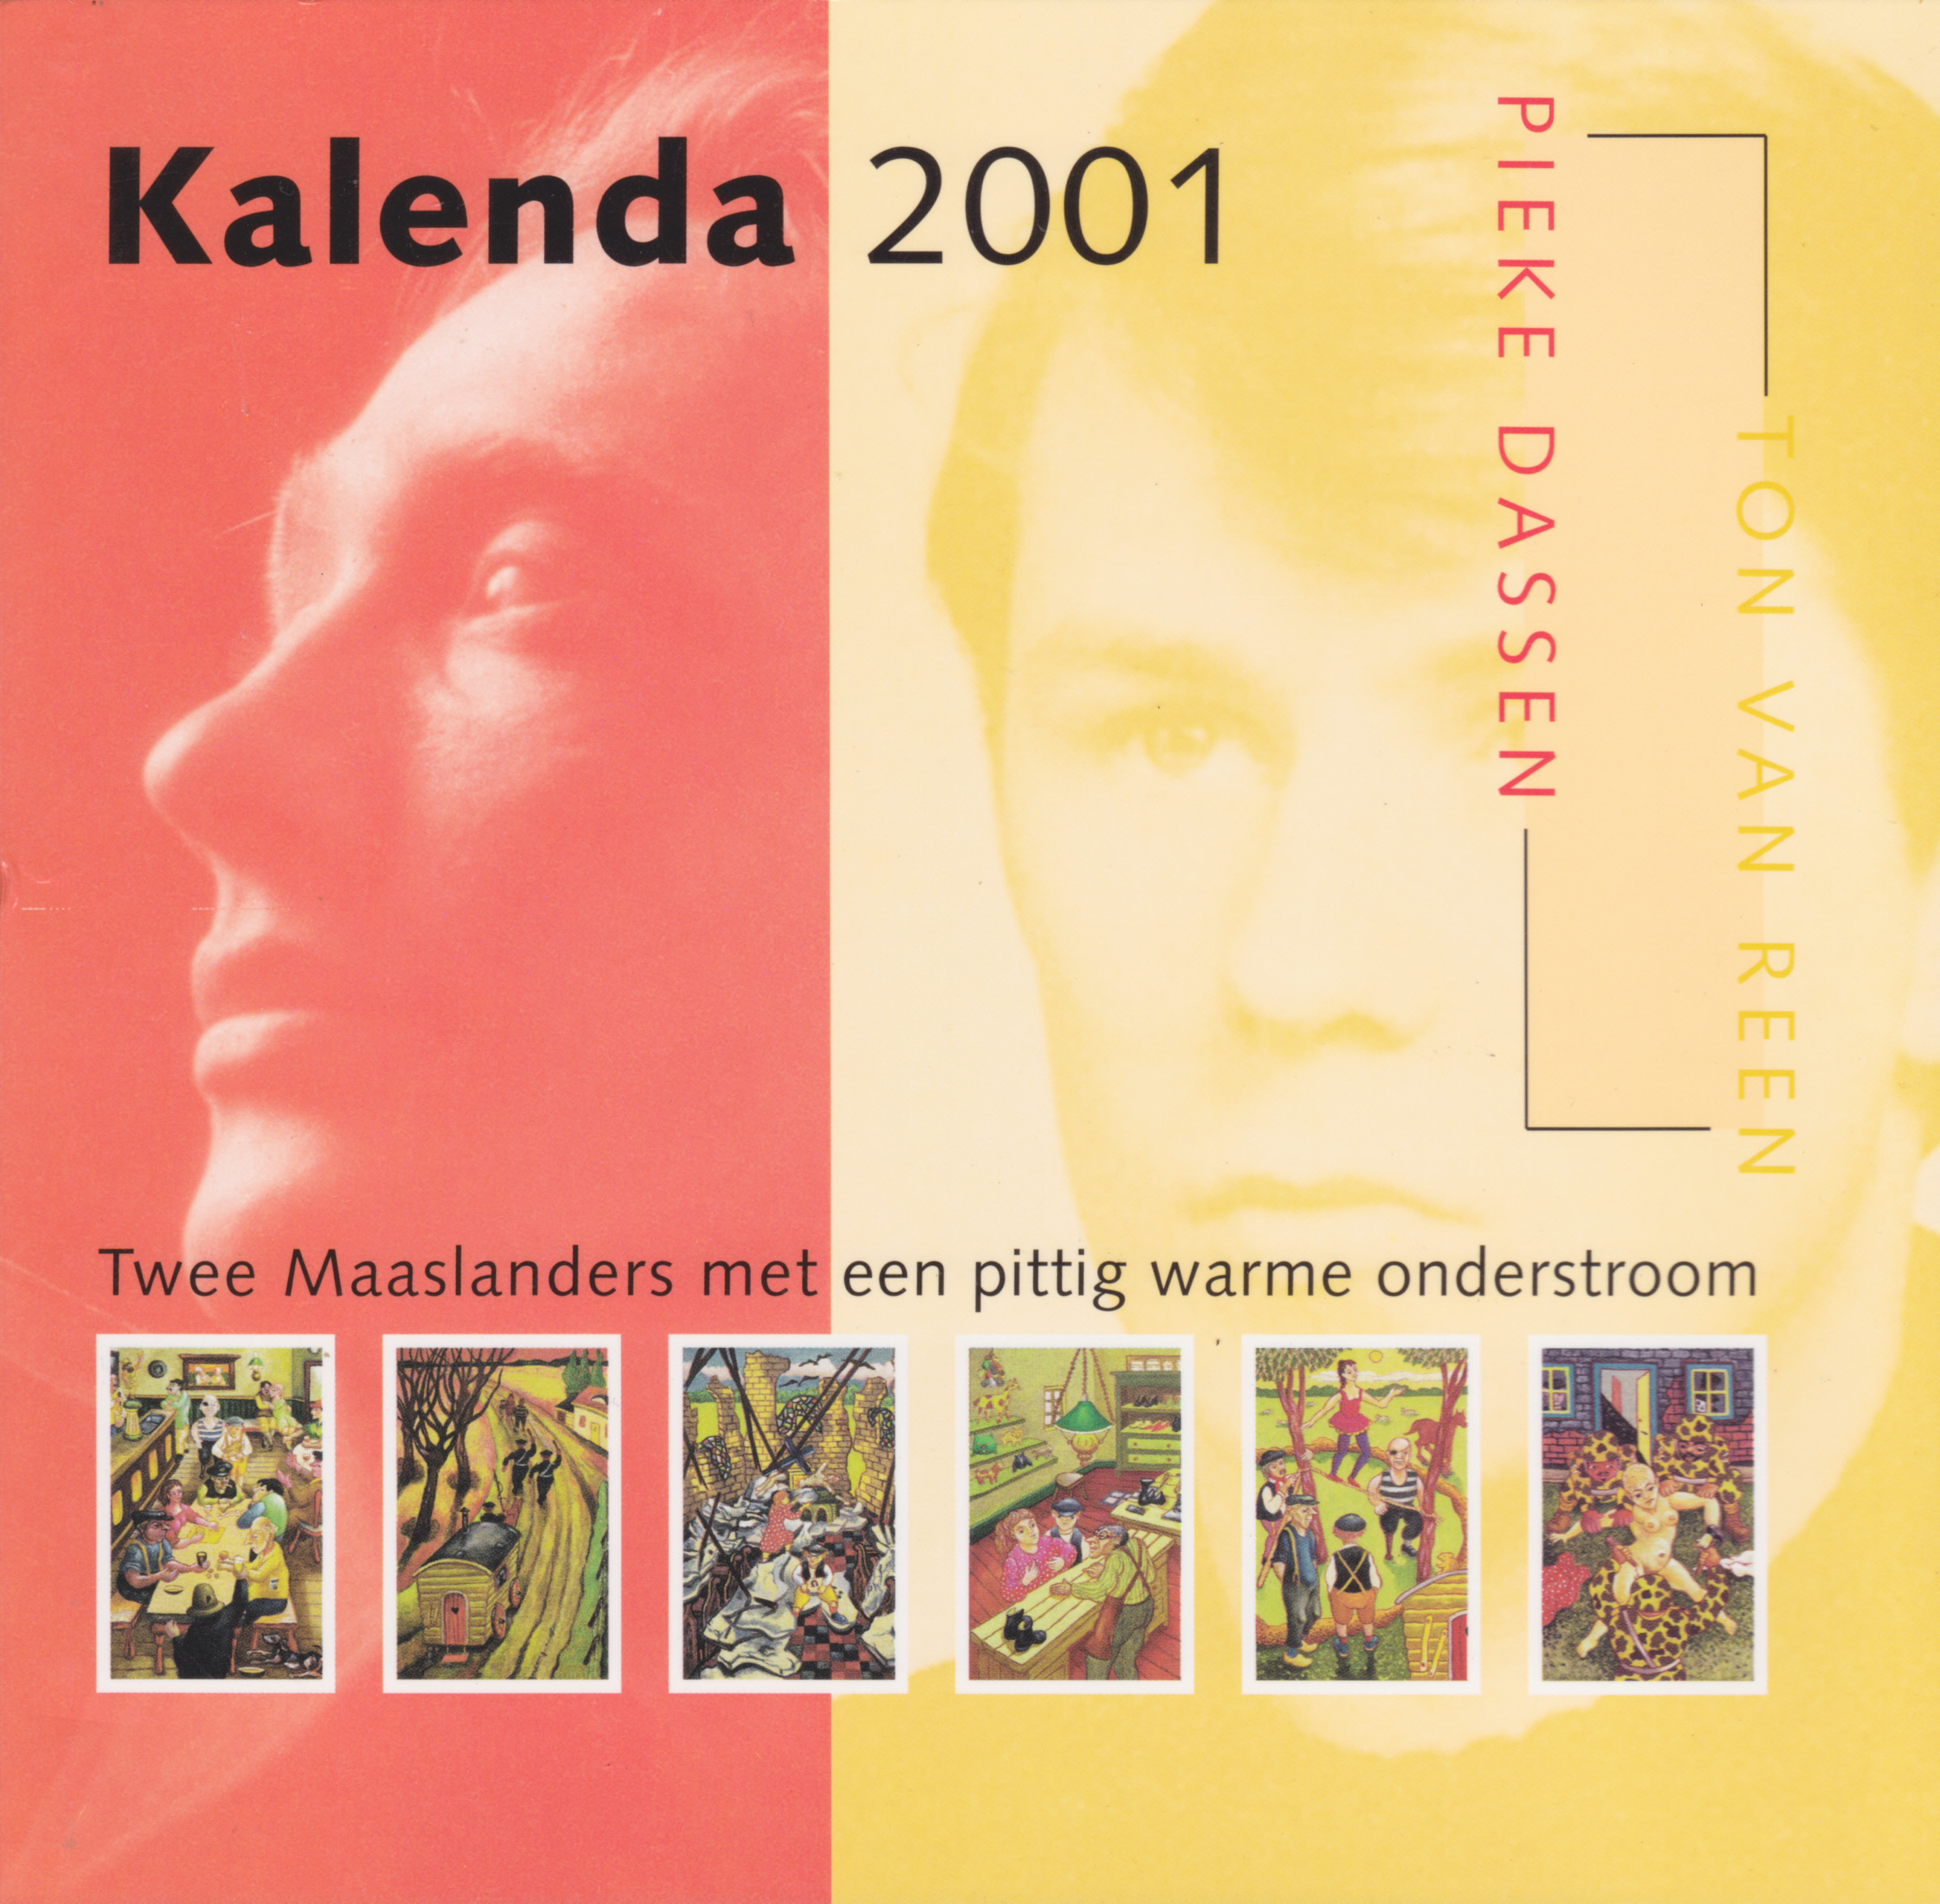 kalender 2001